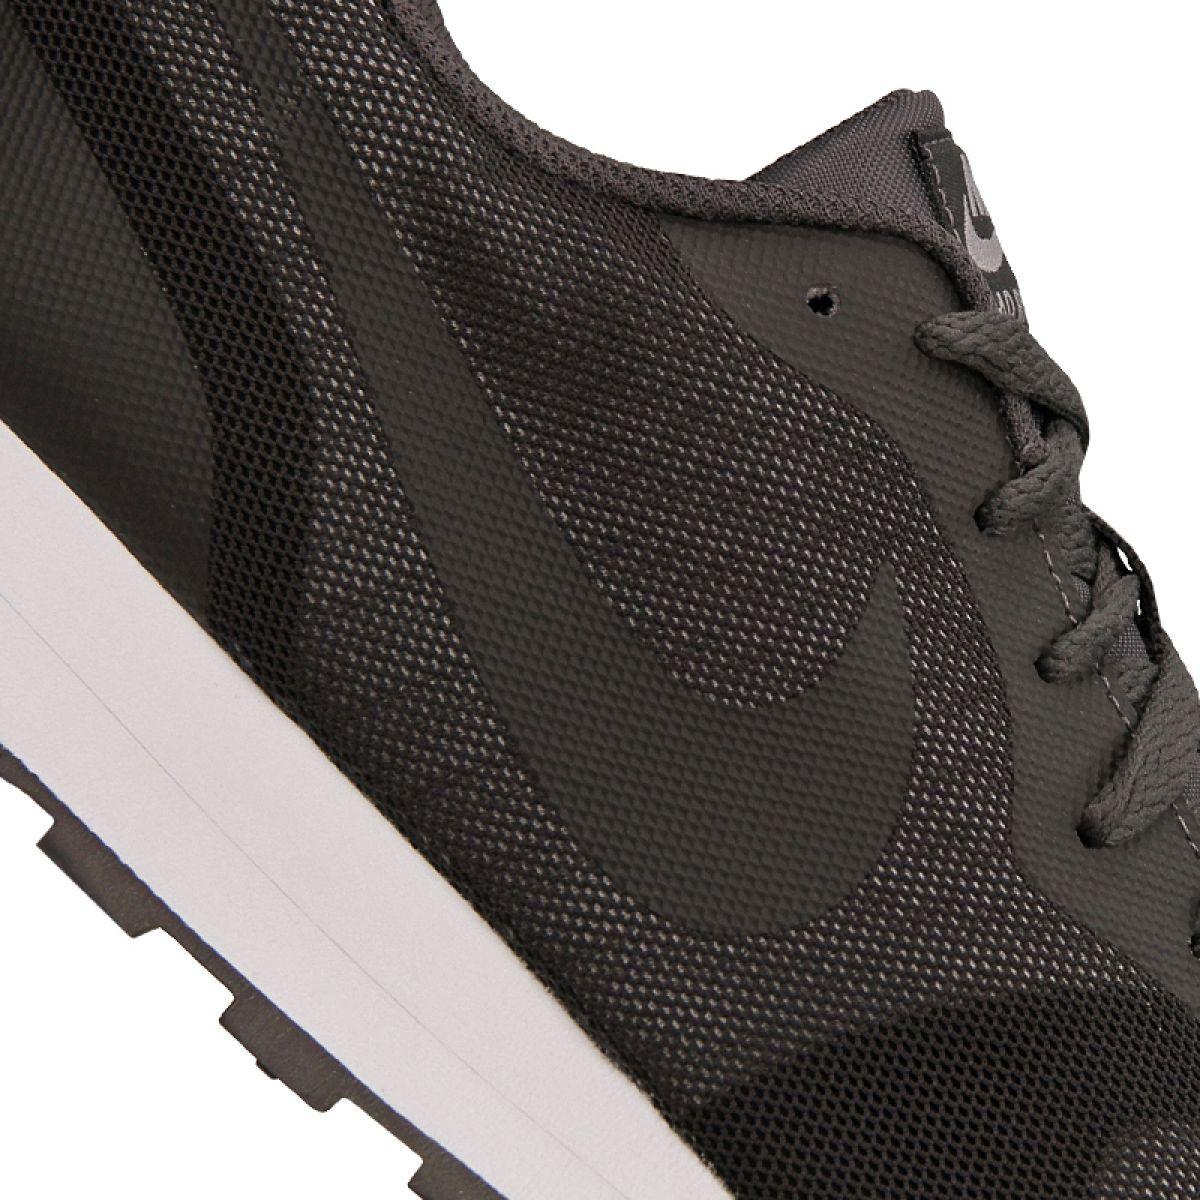 Buty Nike Md Runner 2 19 M AO0265 003 czarne